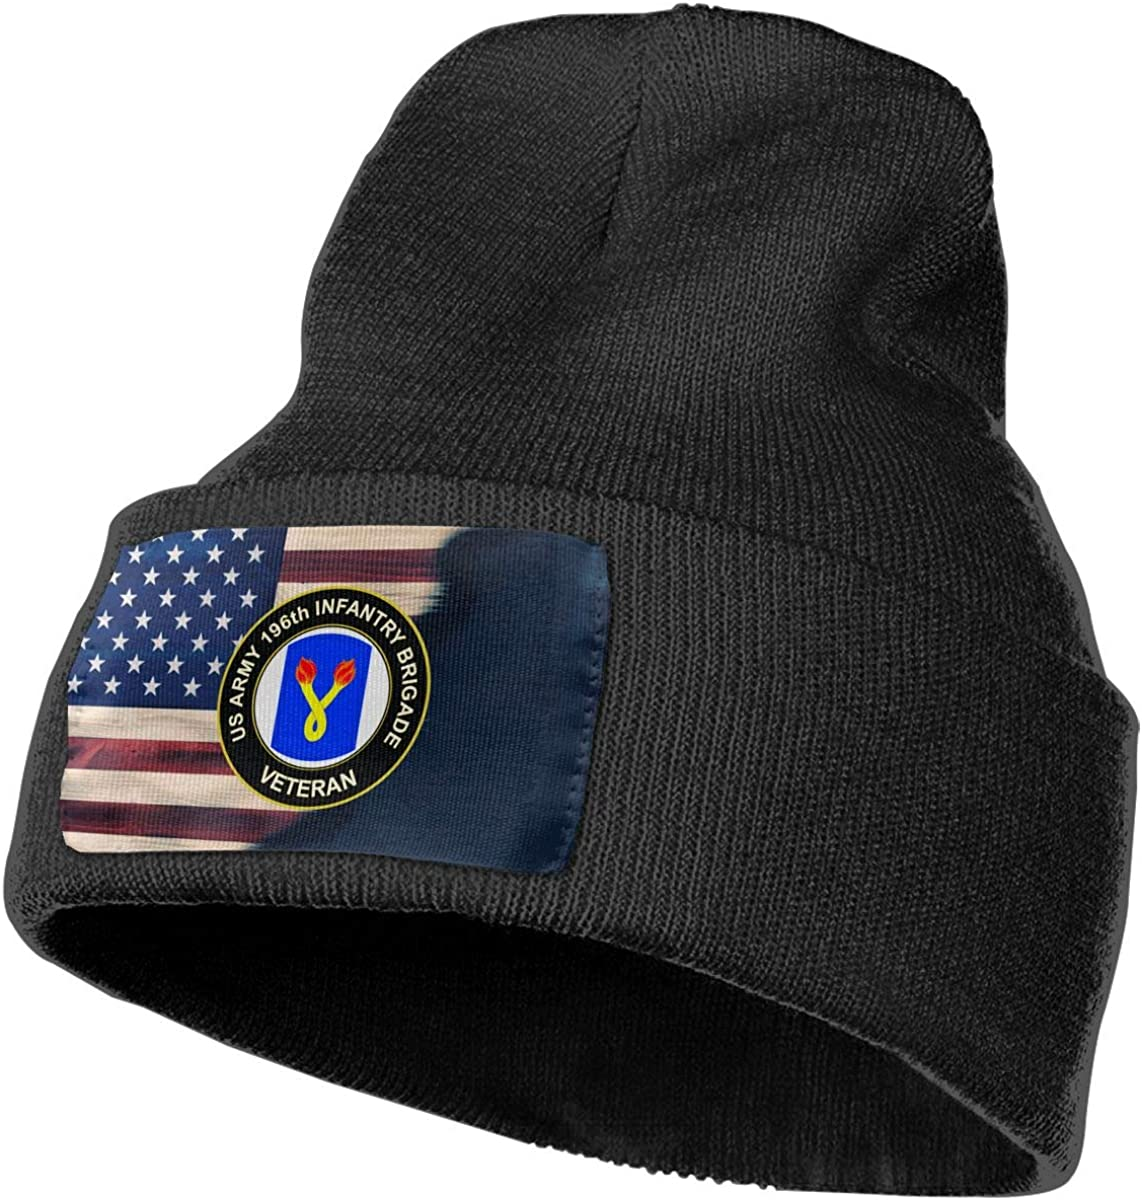 US Army 196th Infantry Brigade Veteran Mens Beanie Cap Skull Cap Winter Warm Knitting Hats.